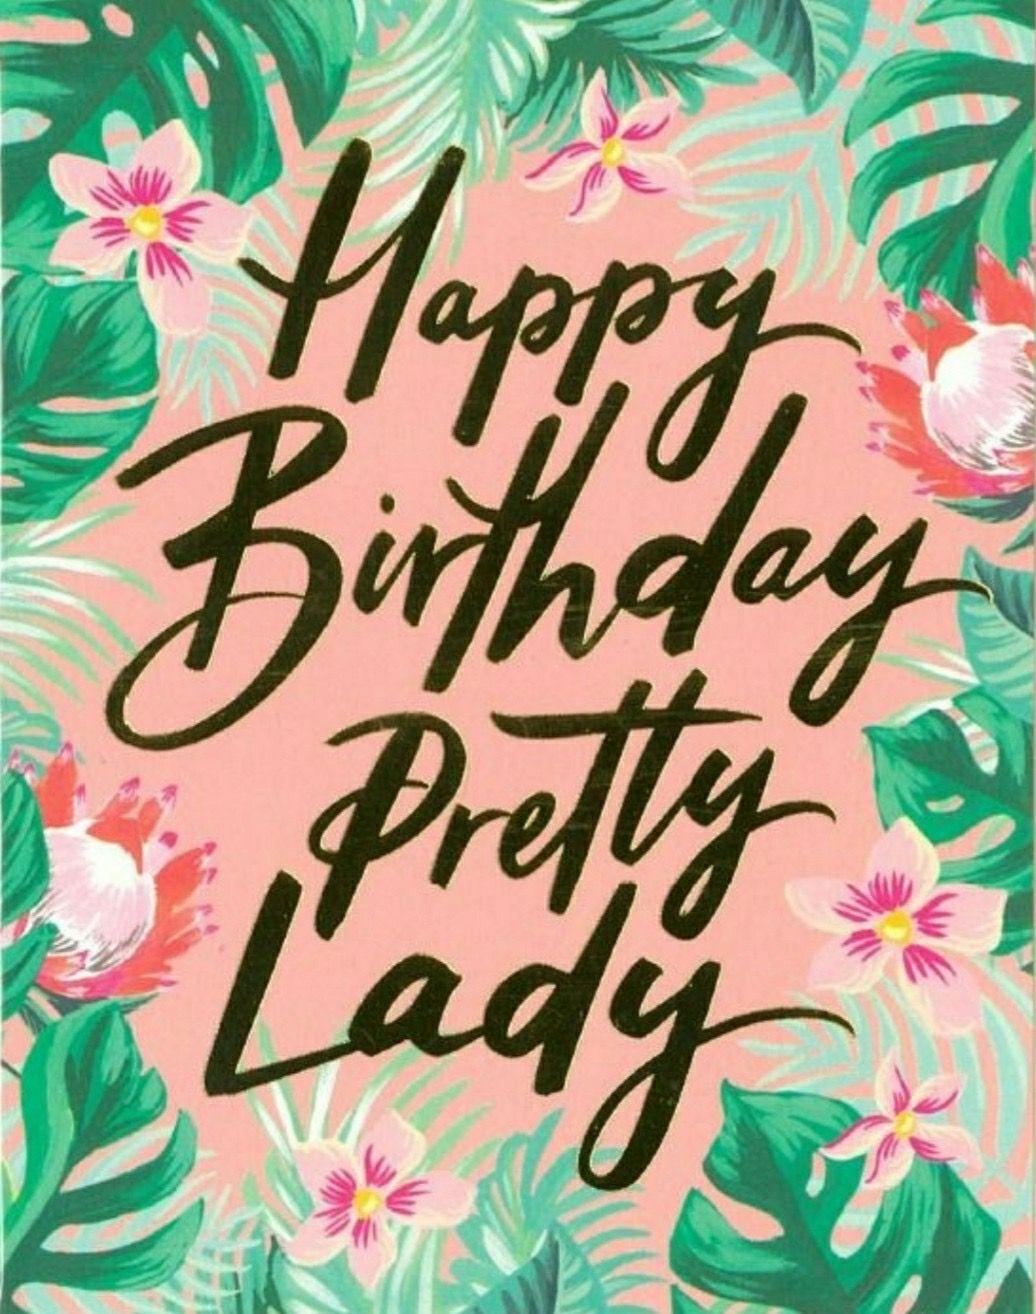 Pin by simone van der kaaij on birthday wishes pinterest hip hip